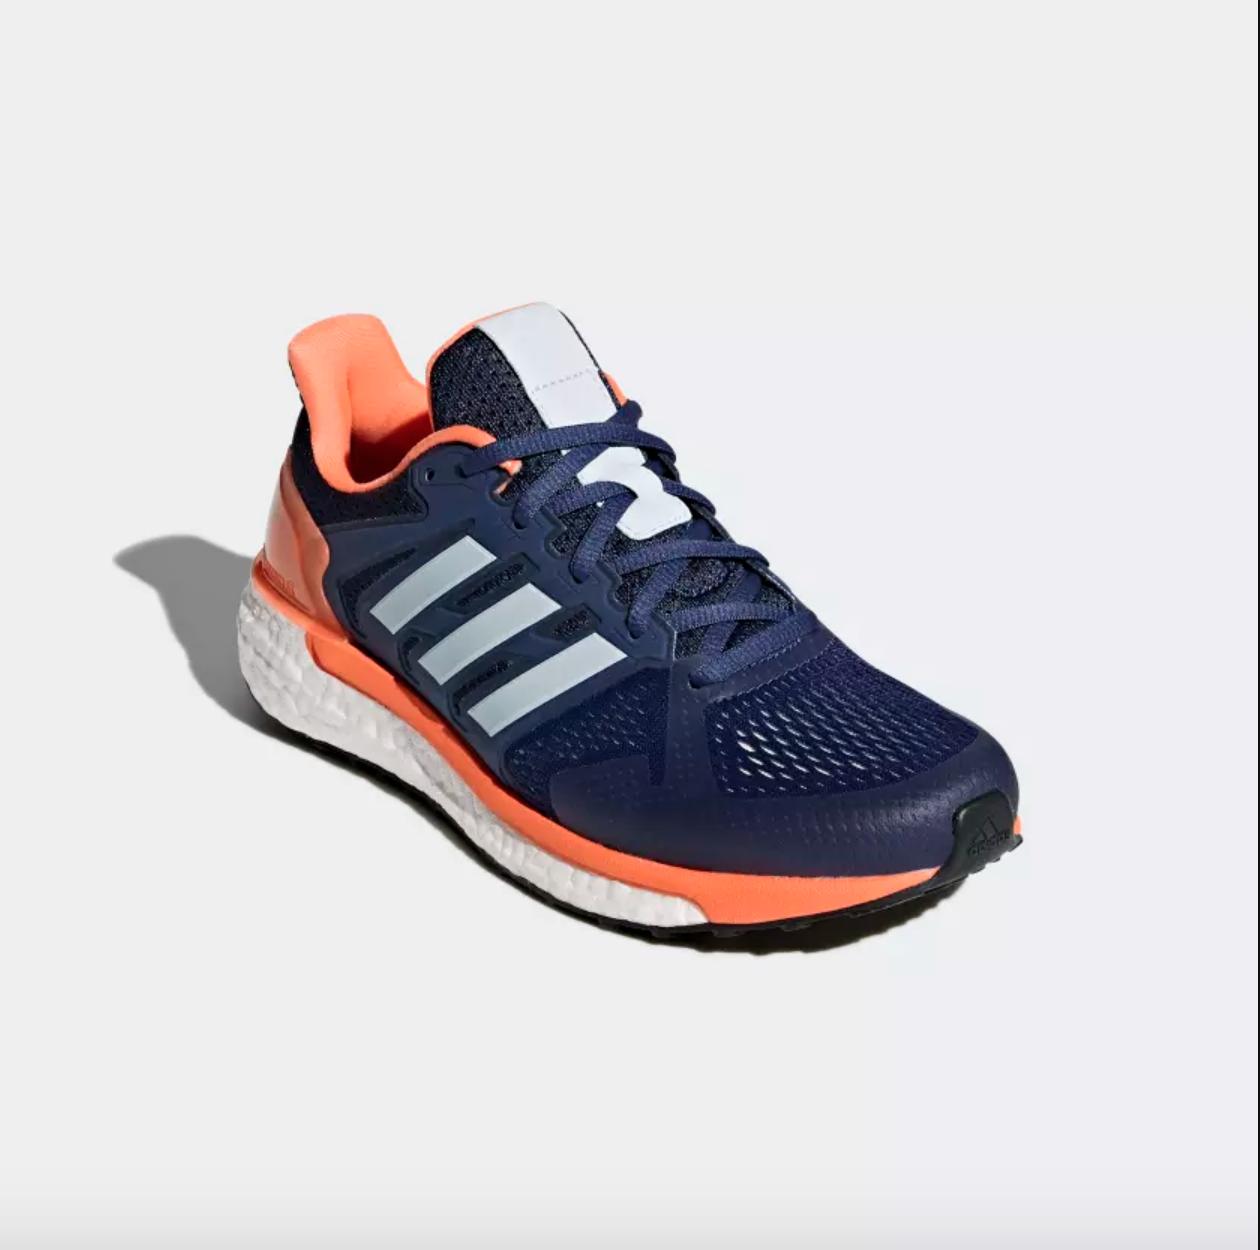 adidas women's supernova st running shoe